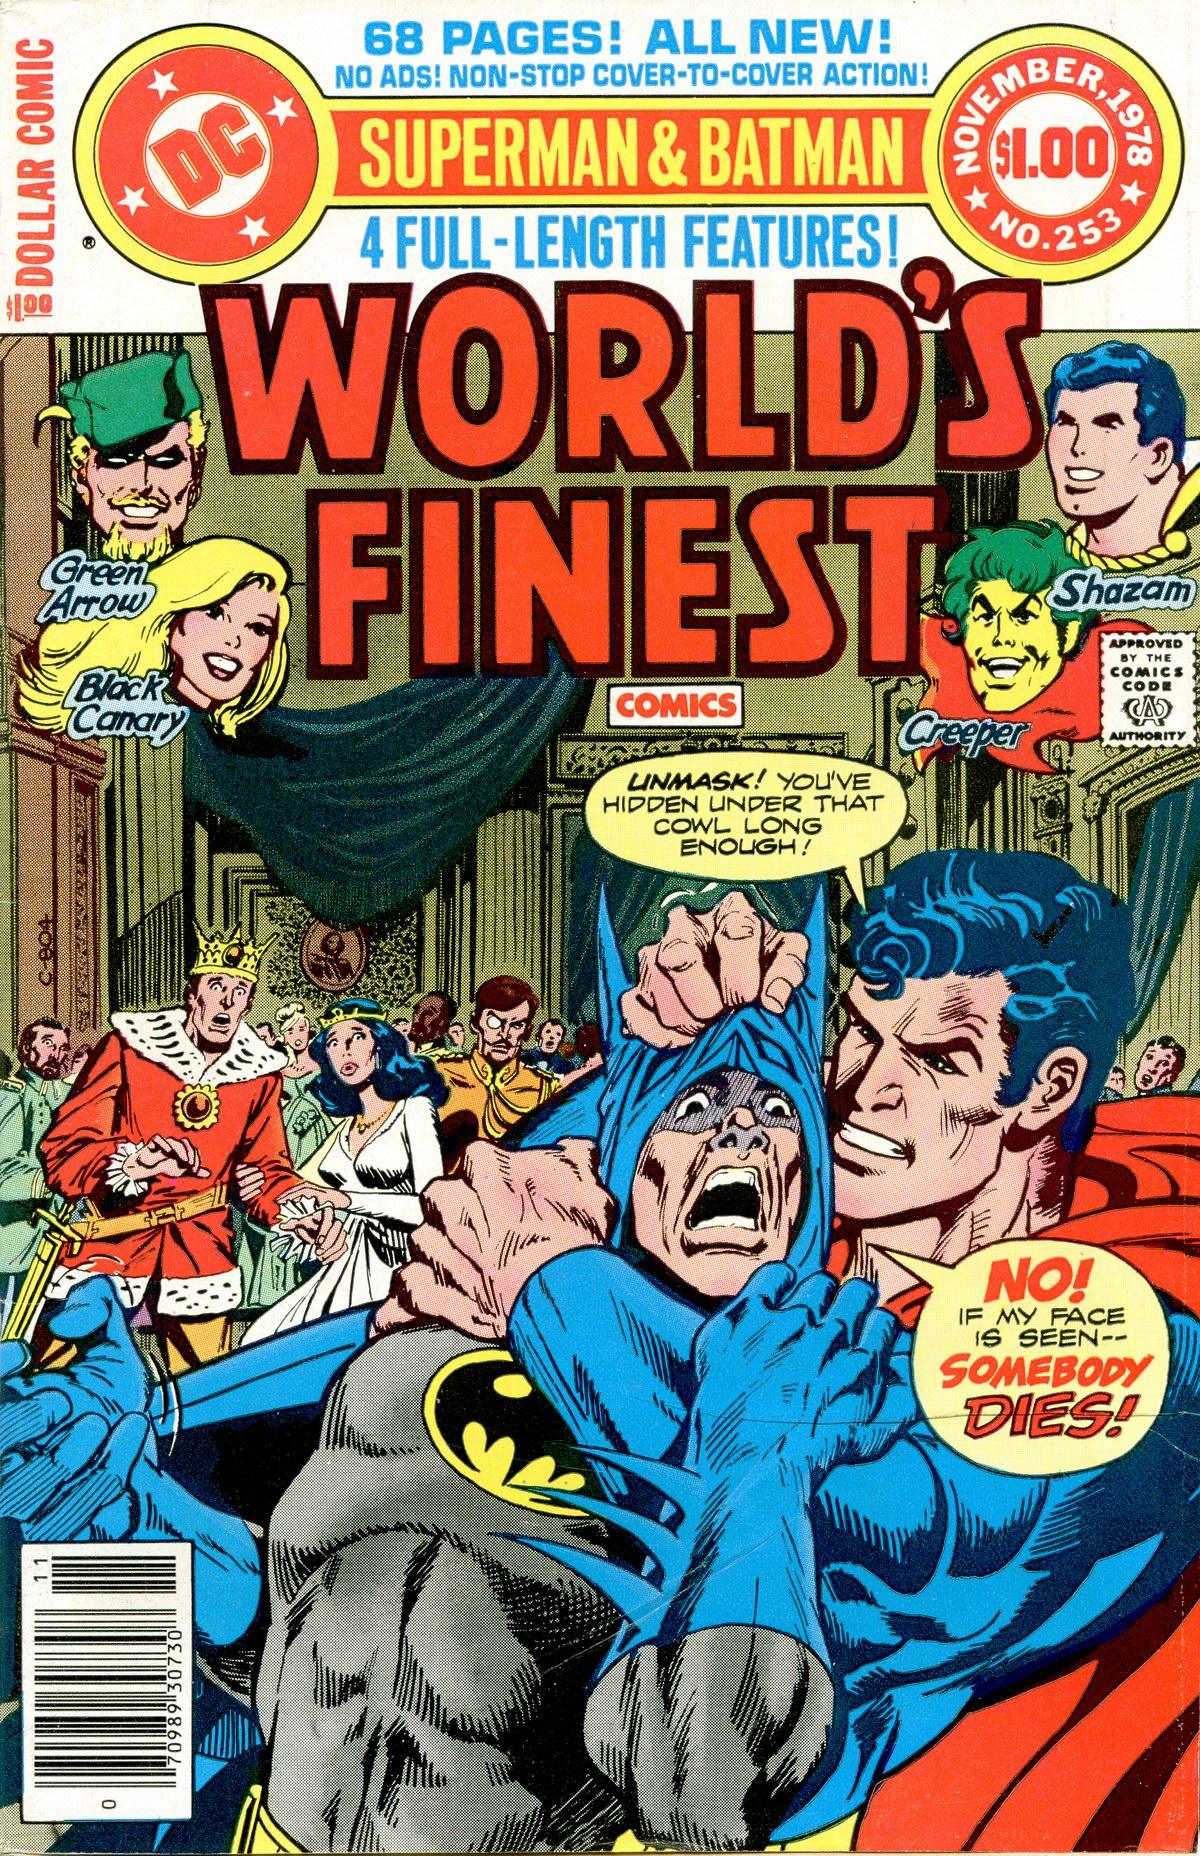 Read online World's Finest Comics comic -  Issue #253 - 2